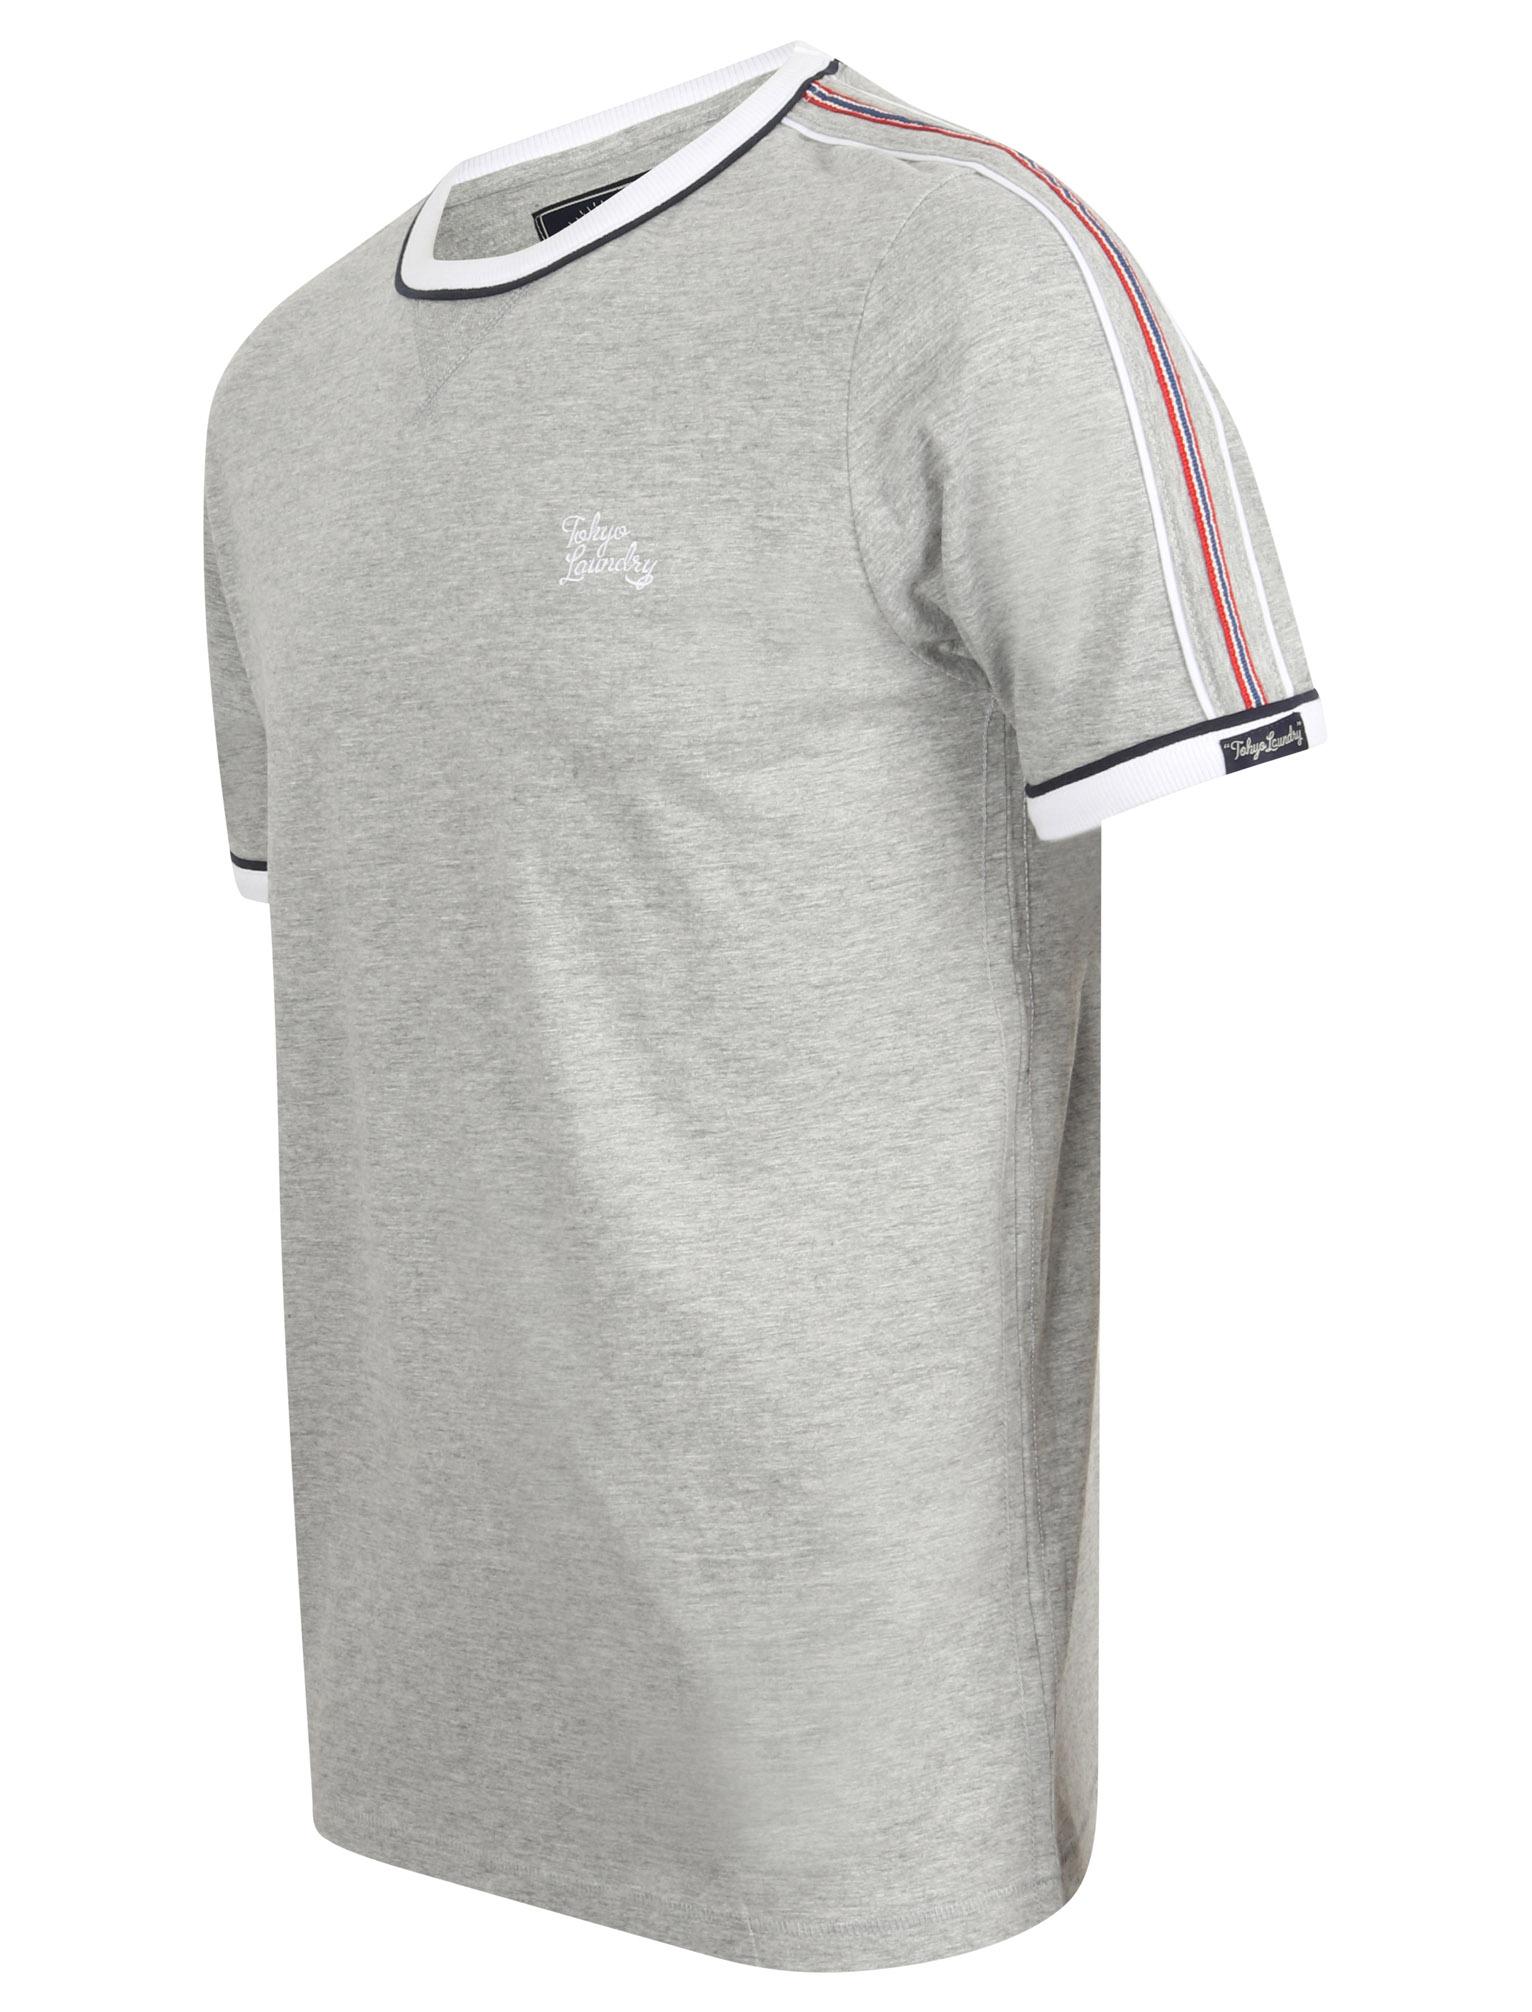 New-Mens-Tokyo-Laundry-Huson-Contrast-Crew-Neck-Cotton-Rich-T-Shirt-Size-S-XXL thumbnail 3